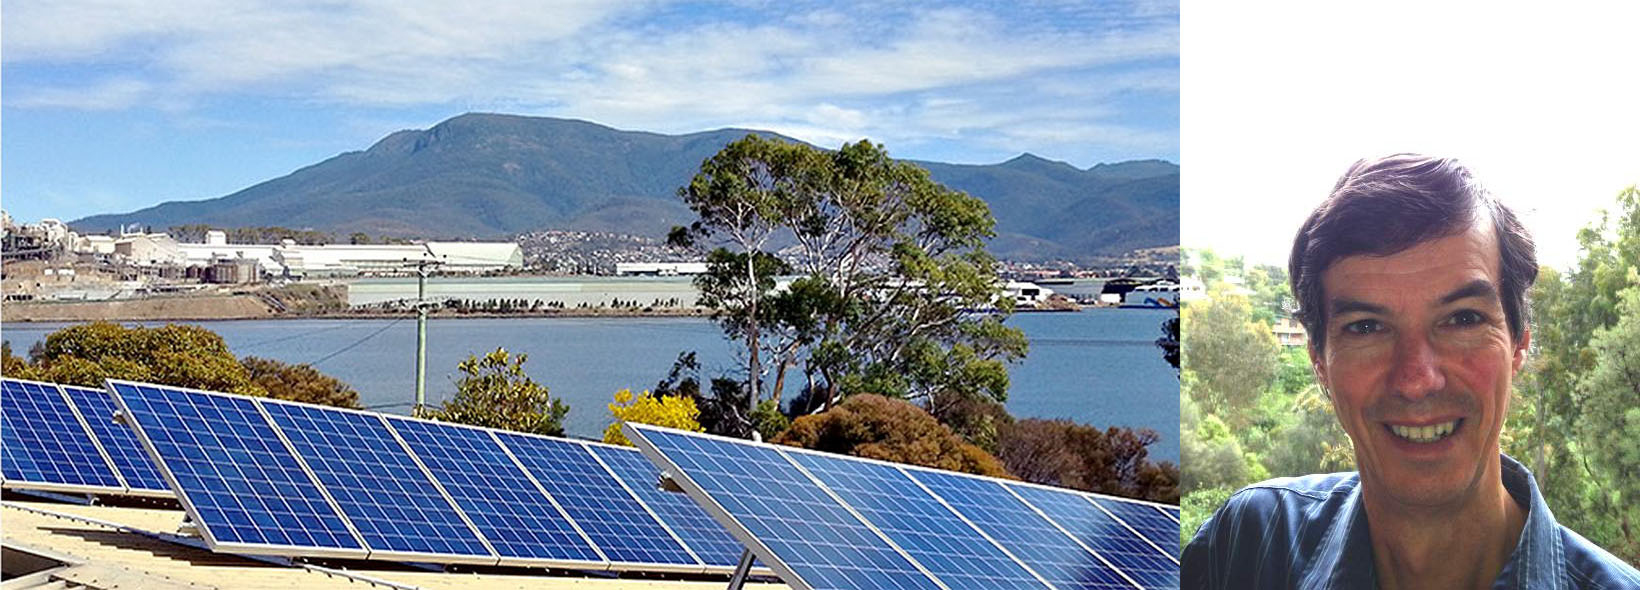 Community renewable energy for Tasmania